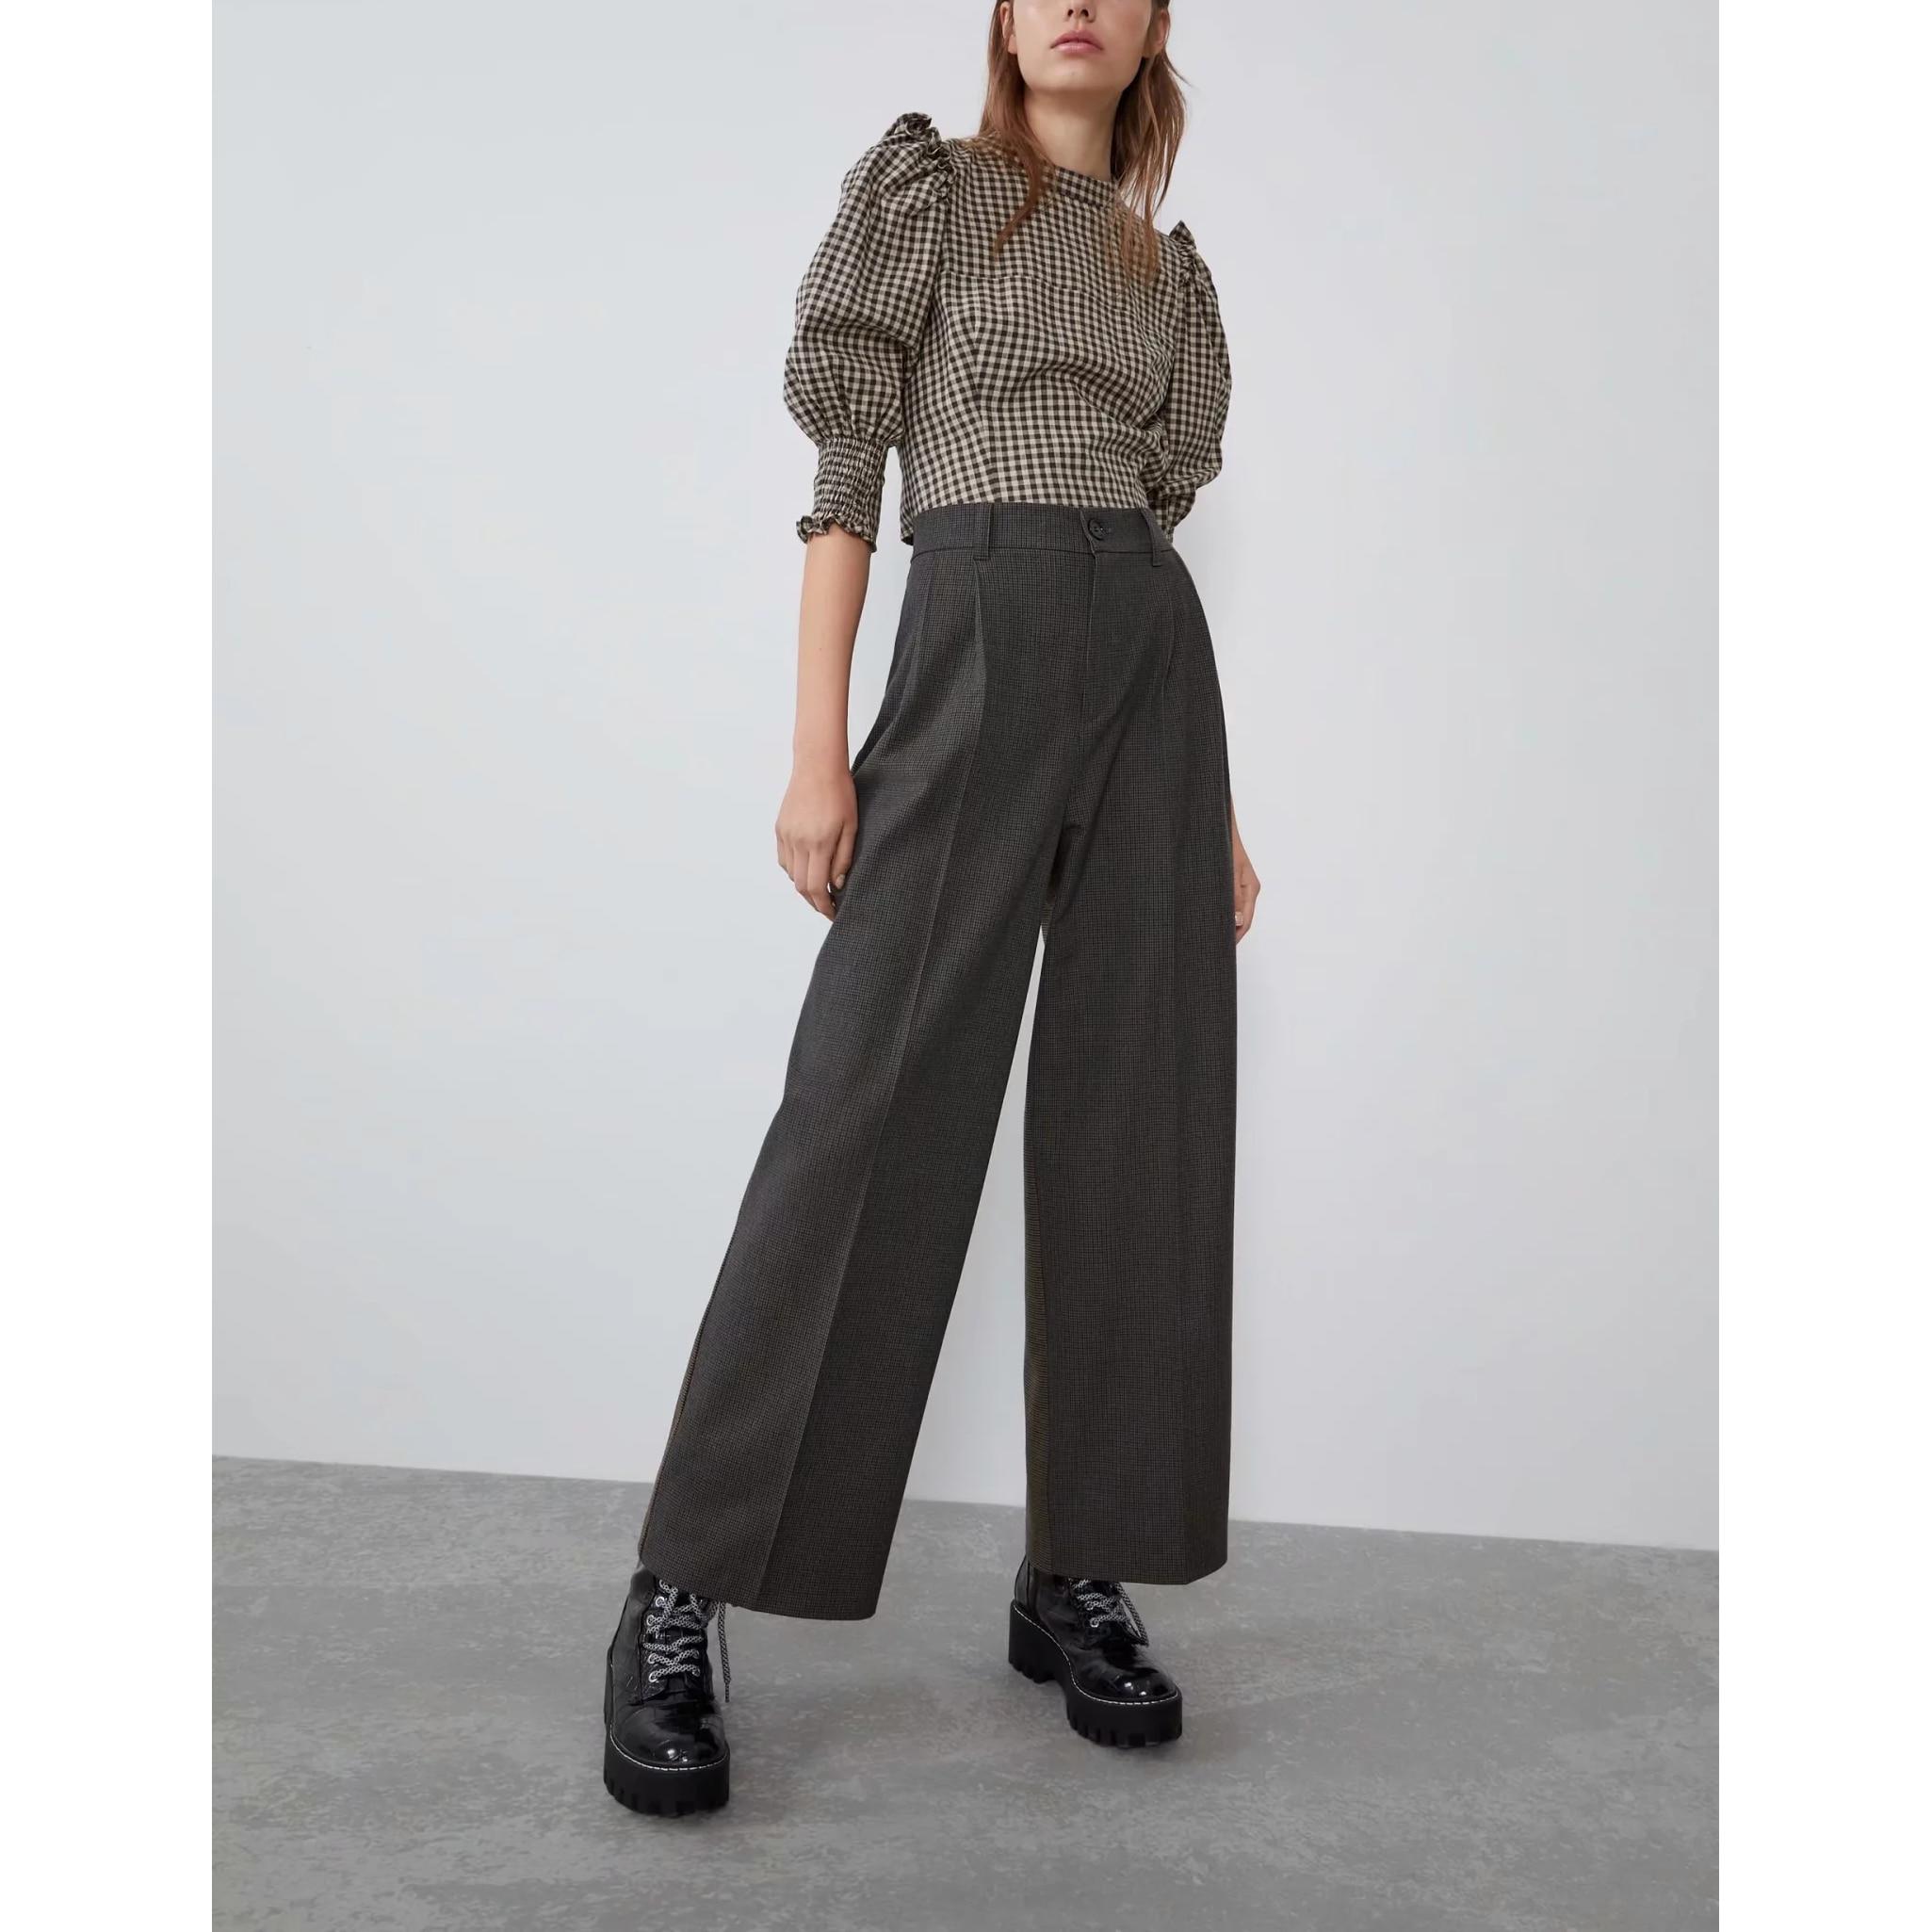 2019 Autumn Winter Stitching Plaid Pants Women Fashion Chic Ladies Suit Pants High Street ZA Style